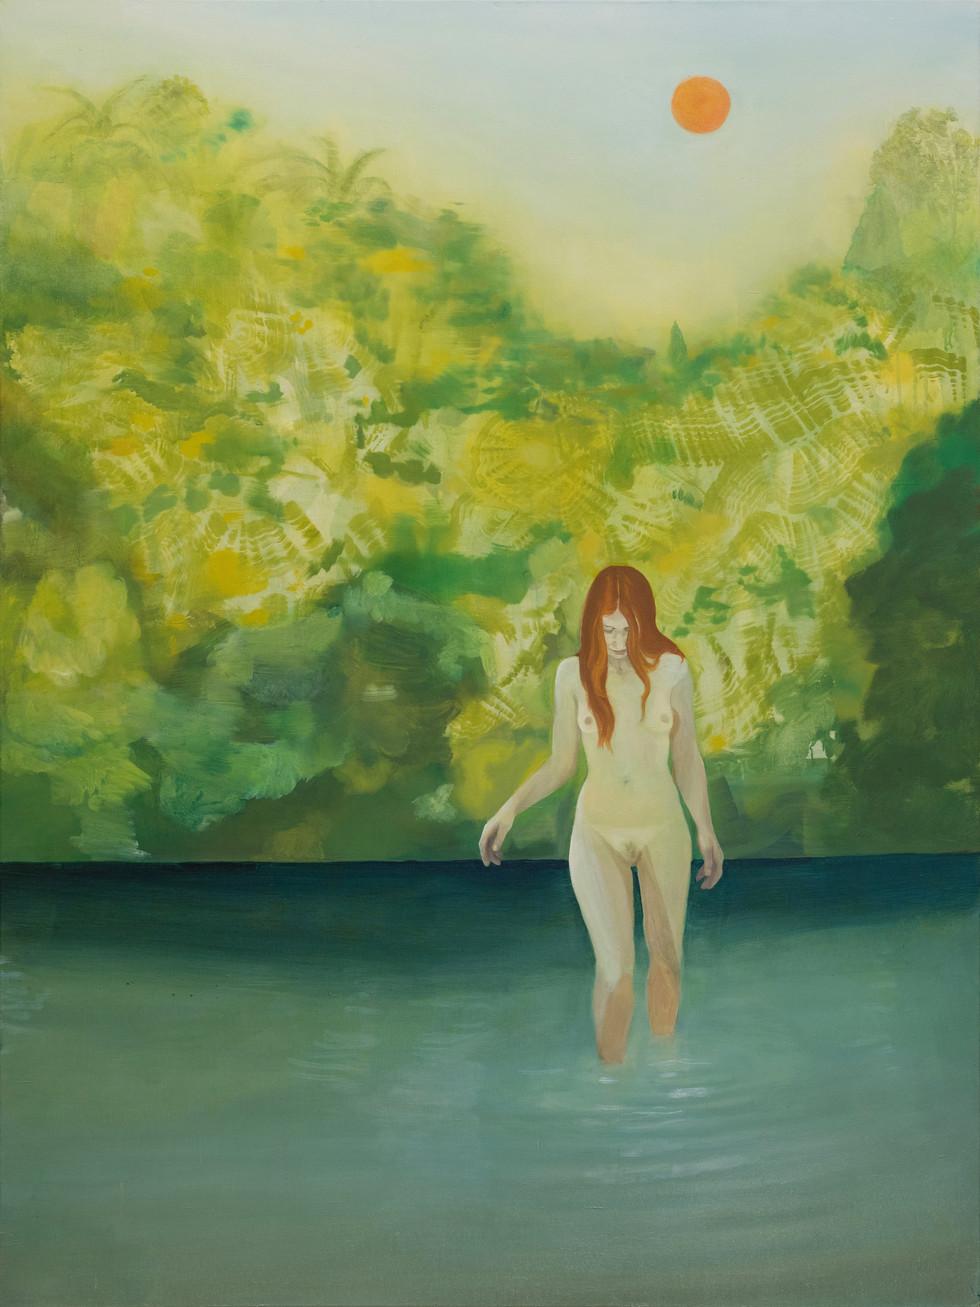 Qui tramonta (Trumusiate), 2020, oil on linen, 200x150 cm